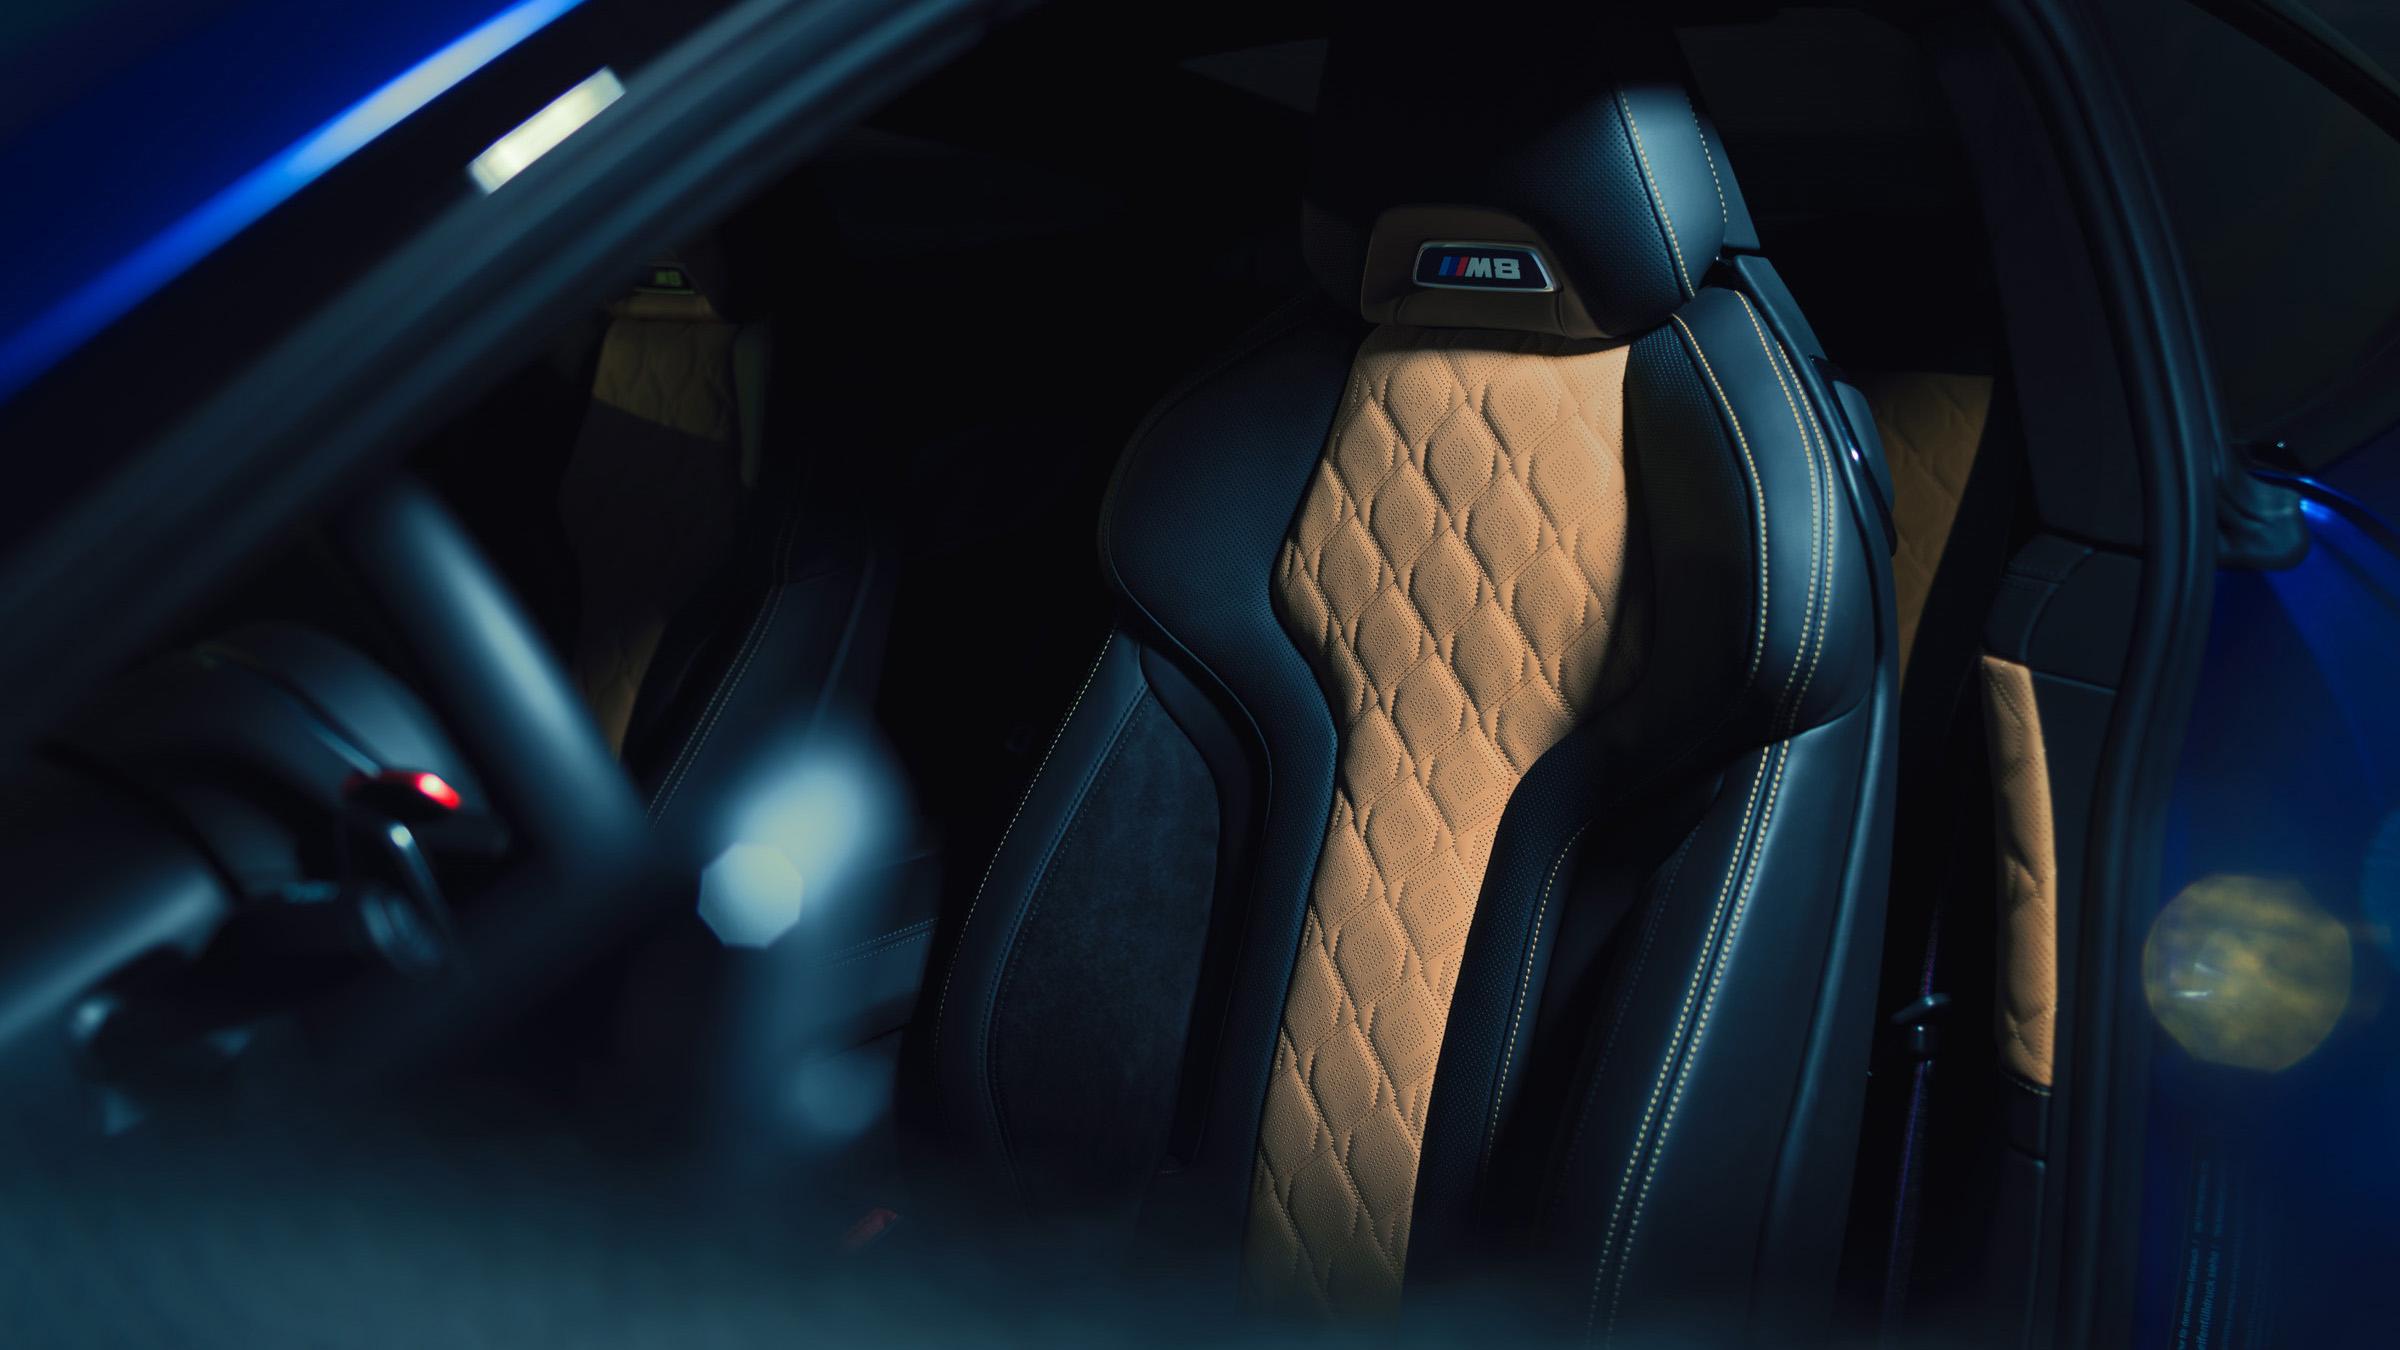 BMW_M8_COUPE_KONRAD_SCHMIDT_08_2400x1350